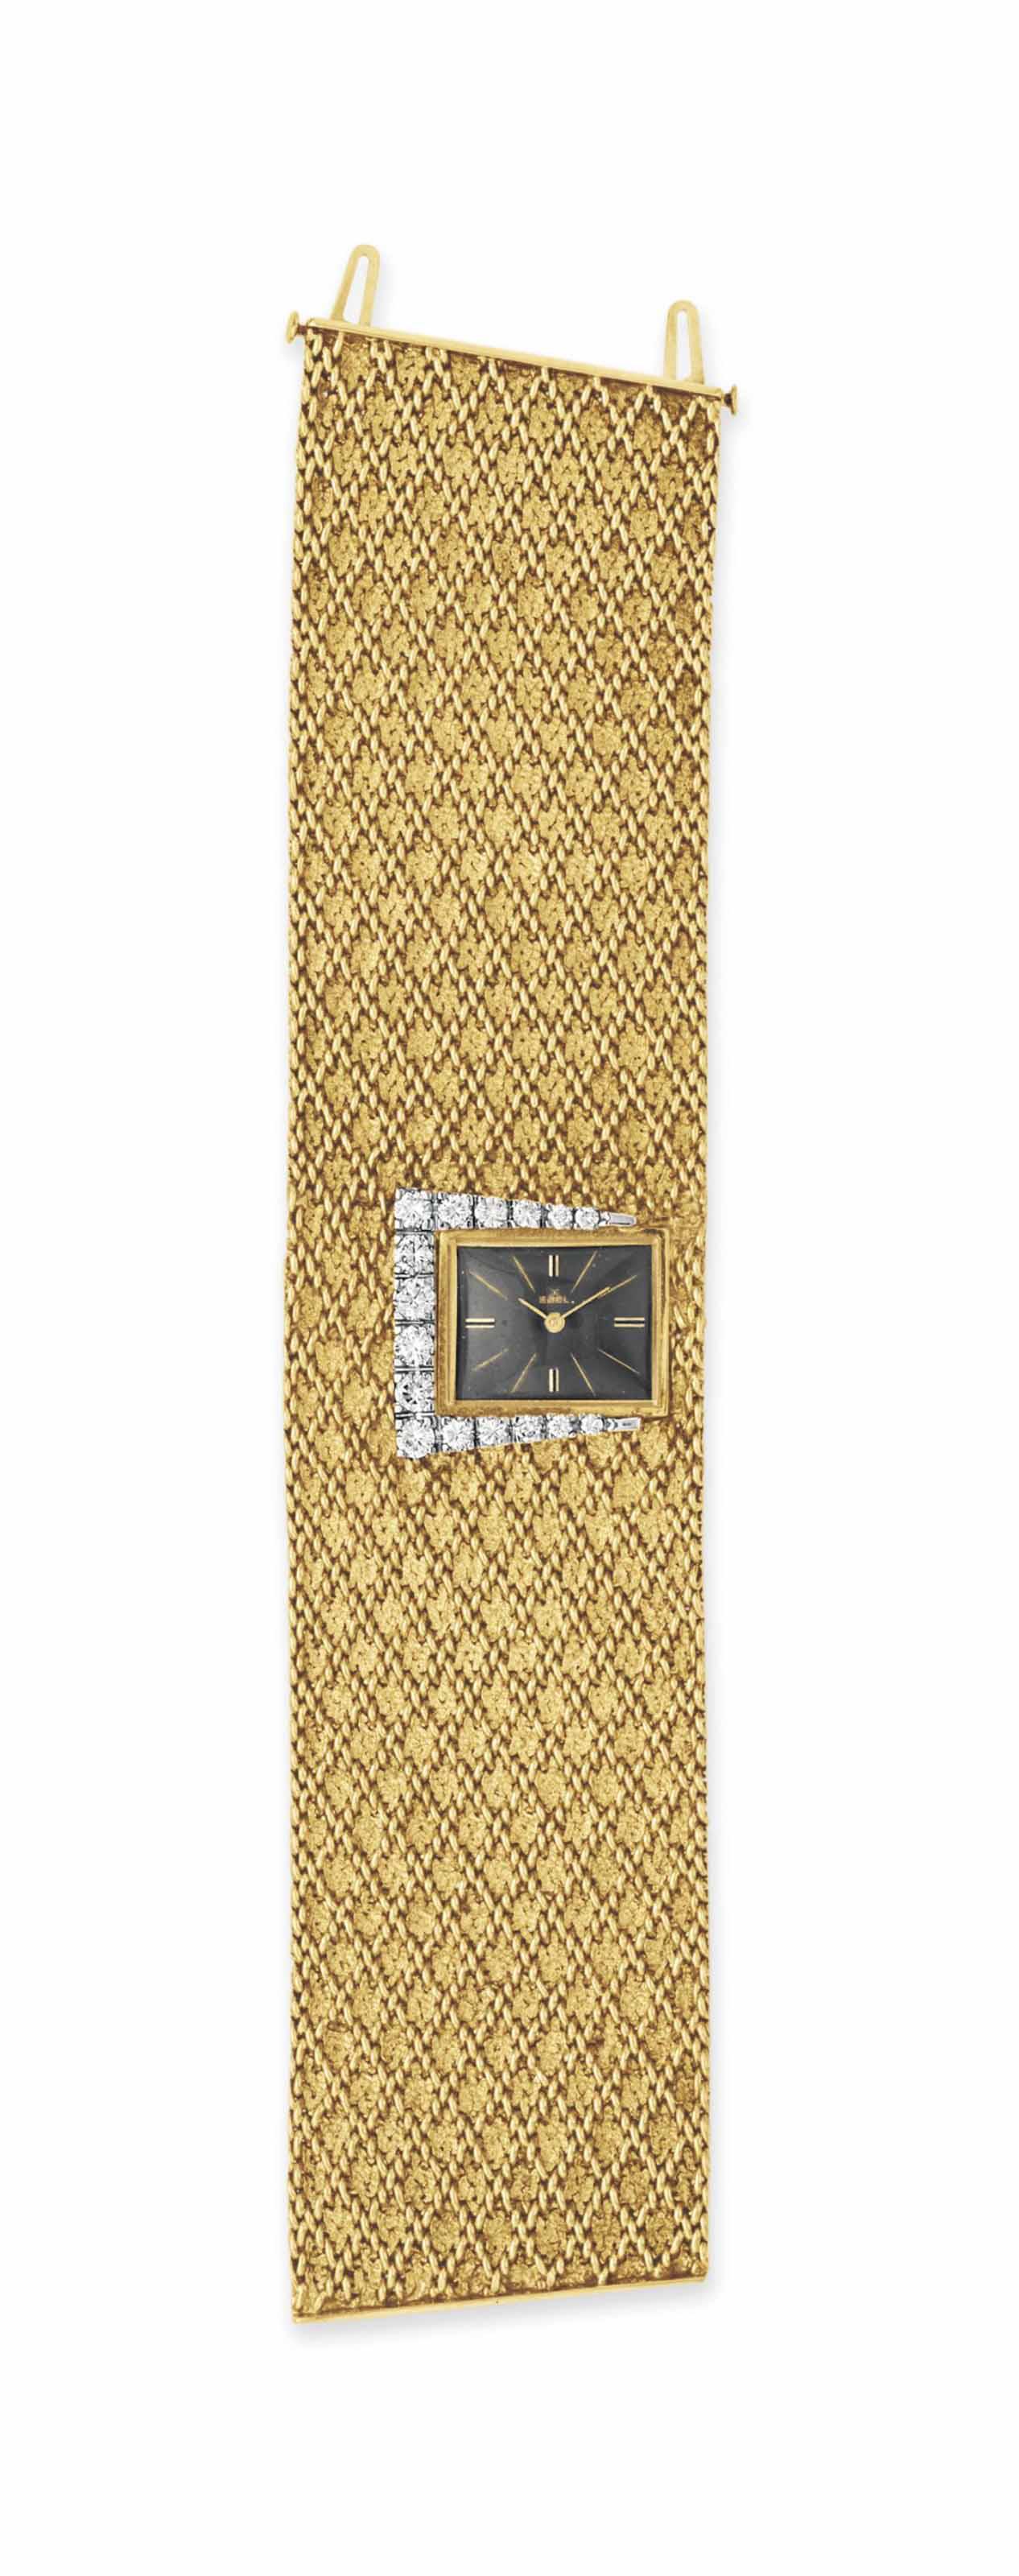 A DIAMOND AND GOLD BRACELET-WATCH, BY EBEL